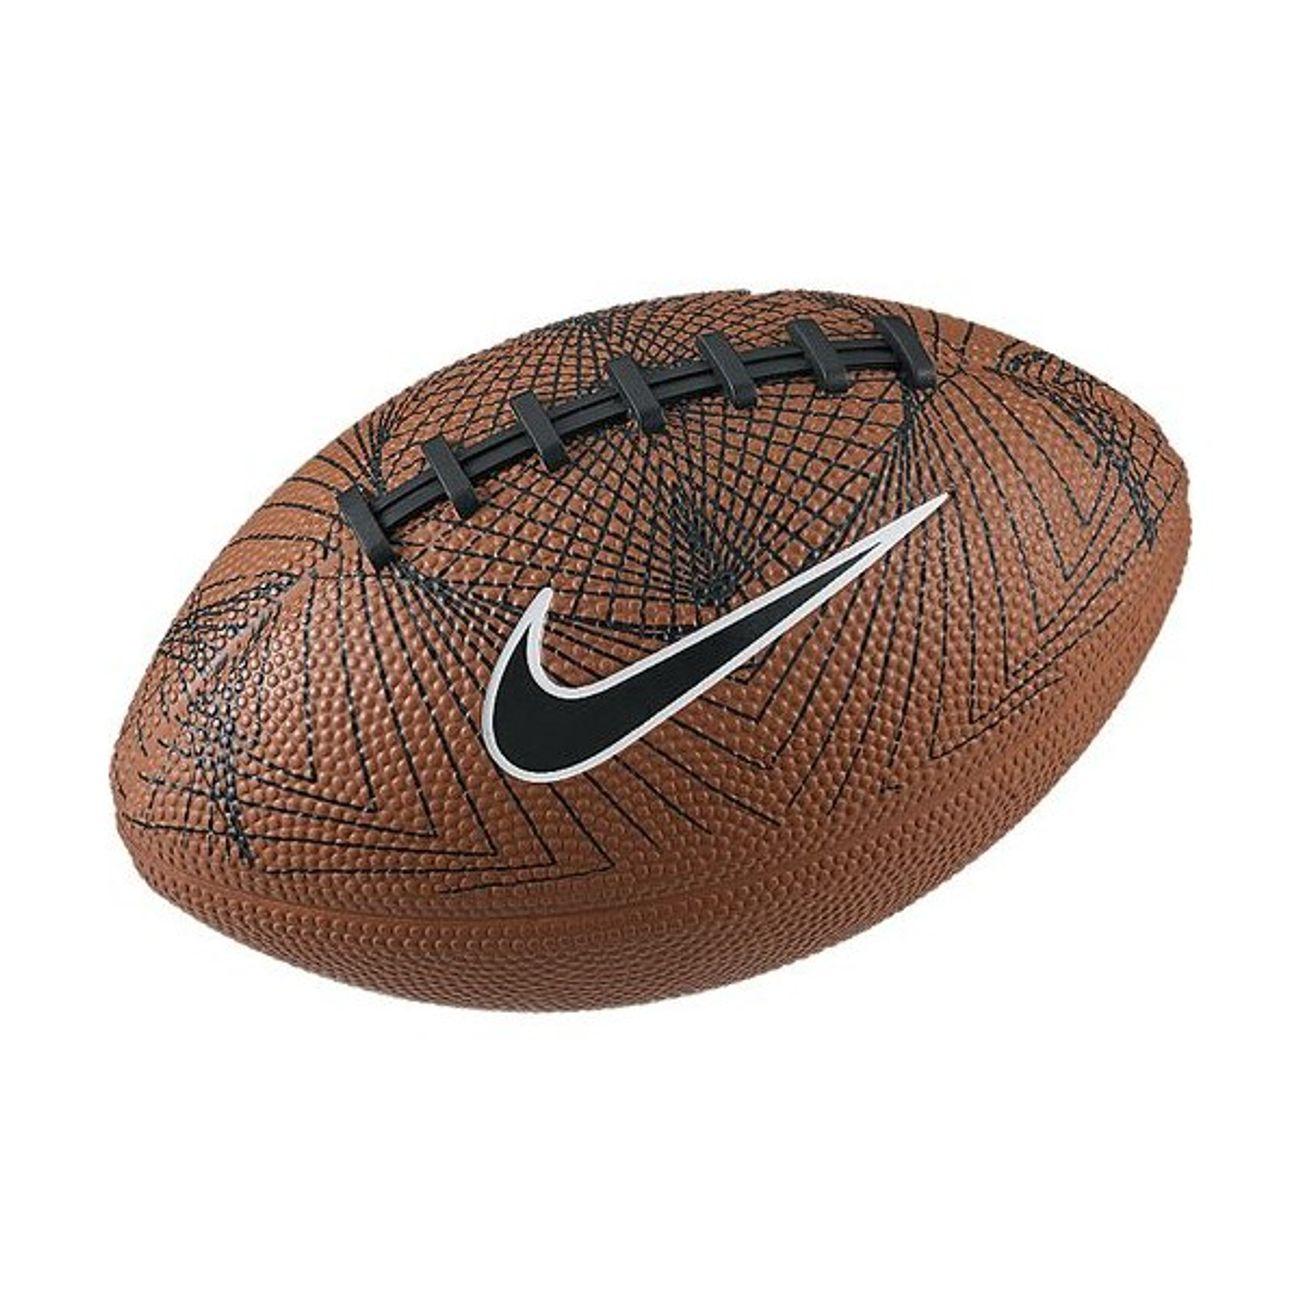 Football US  NIKE Mini ballon de Football Américain Nike 500 marron